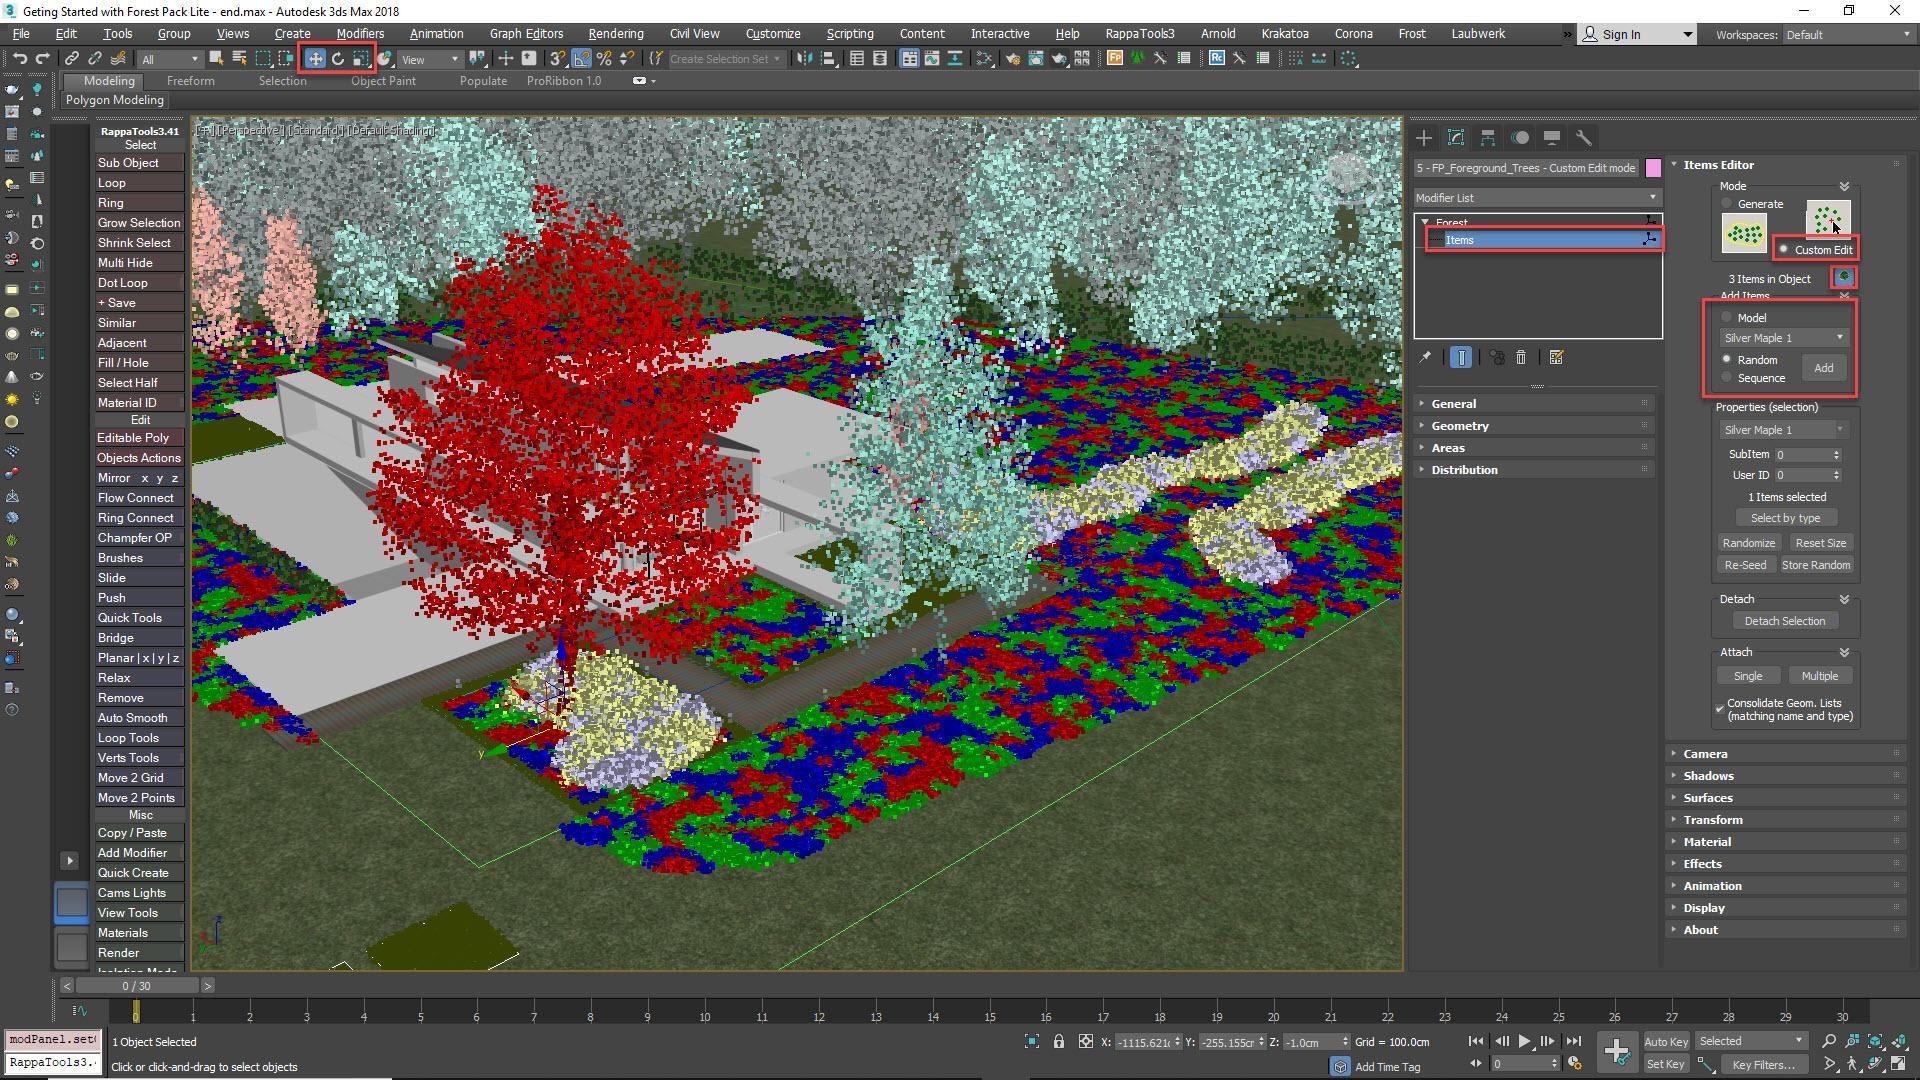 Using Item editor mode